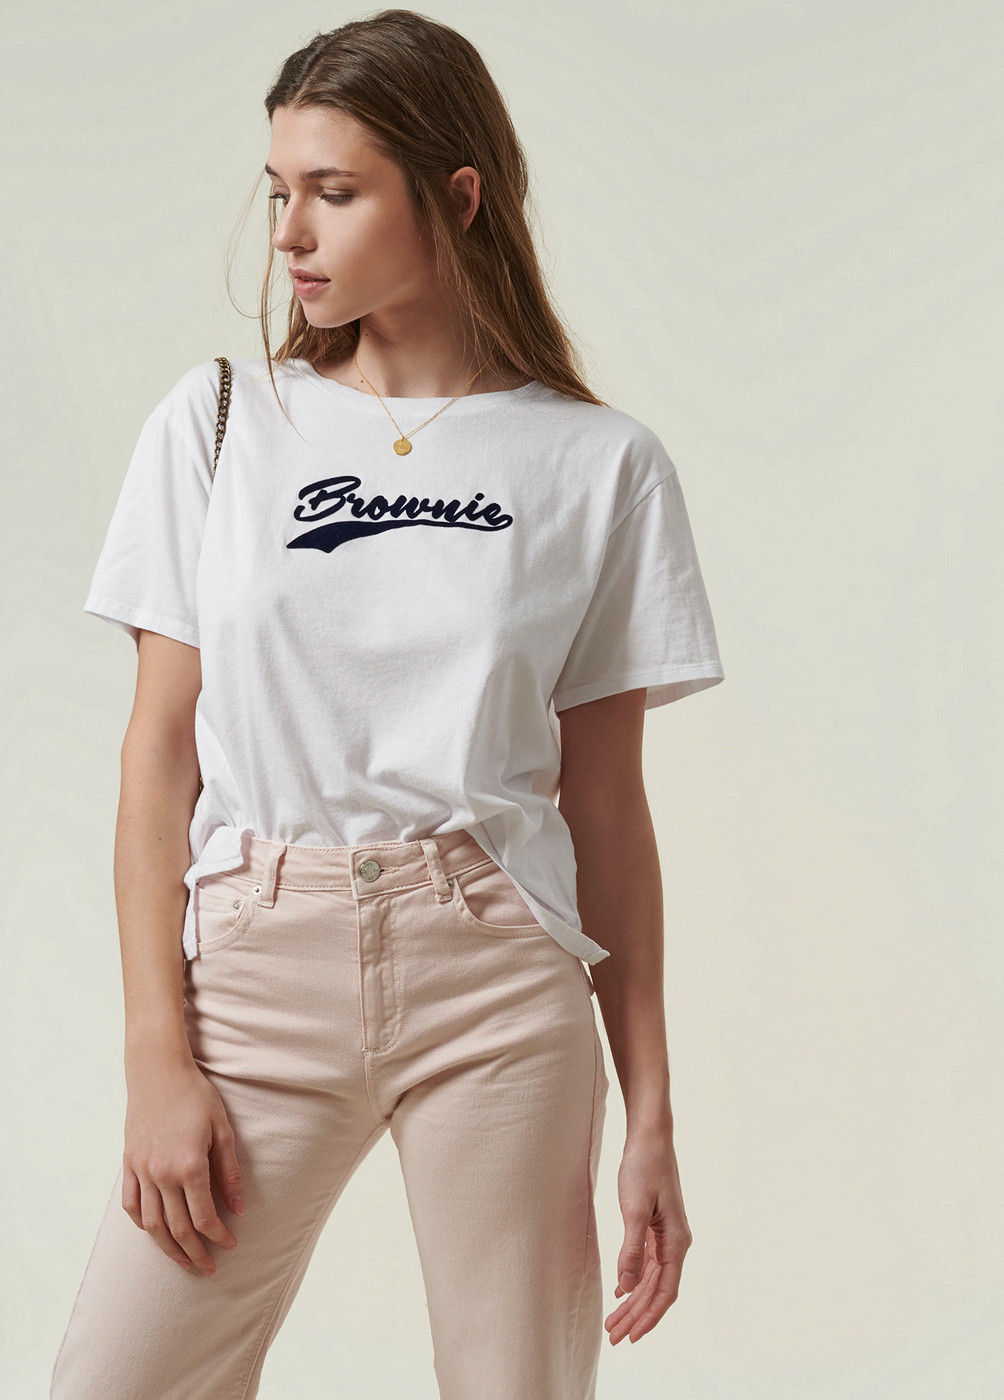 Camiseta Well Brownie Baseball